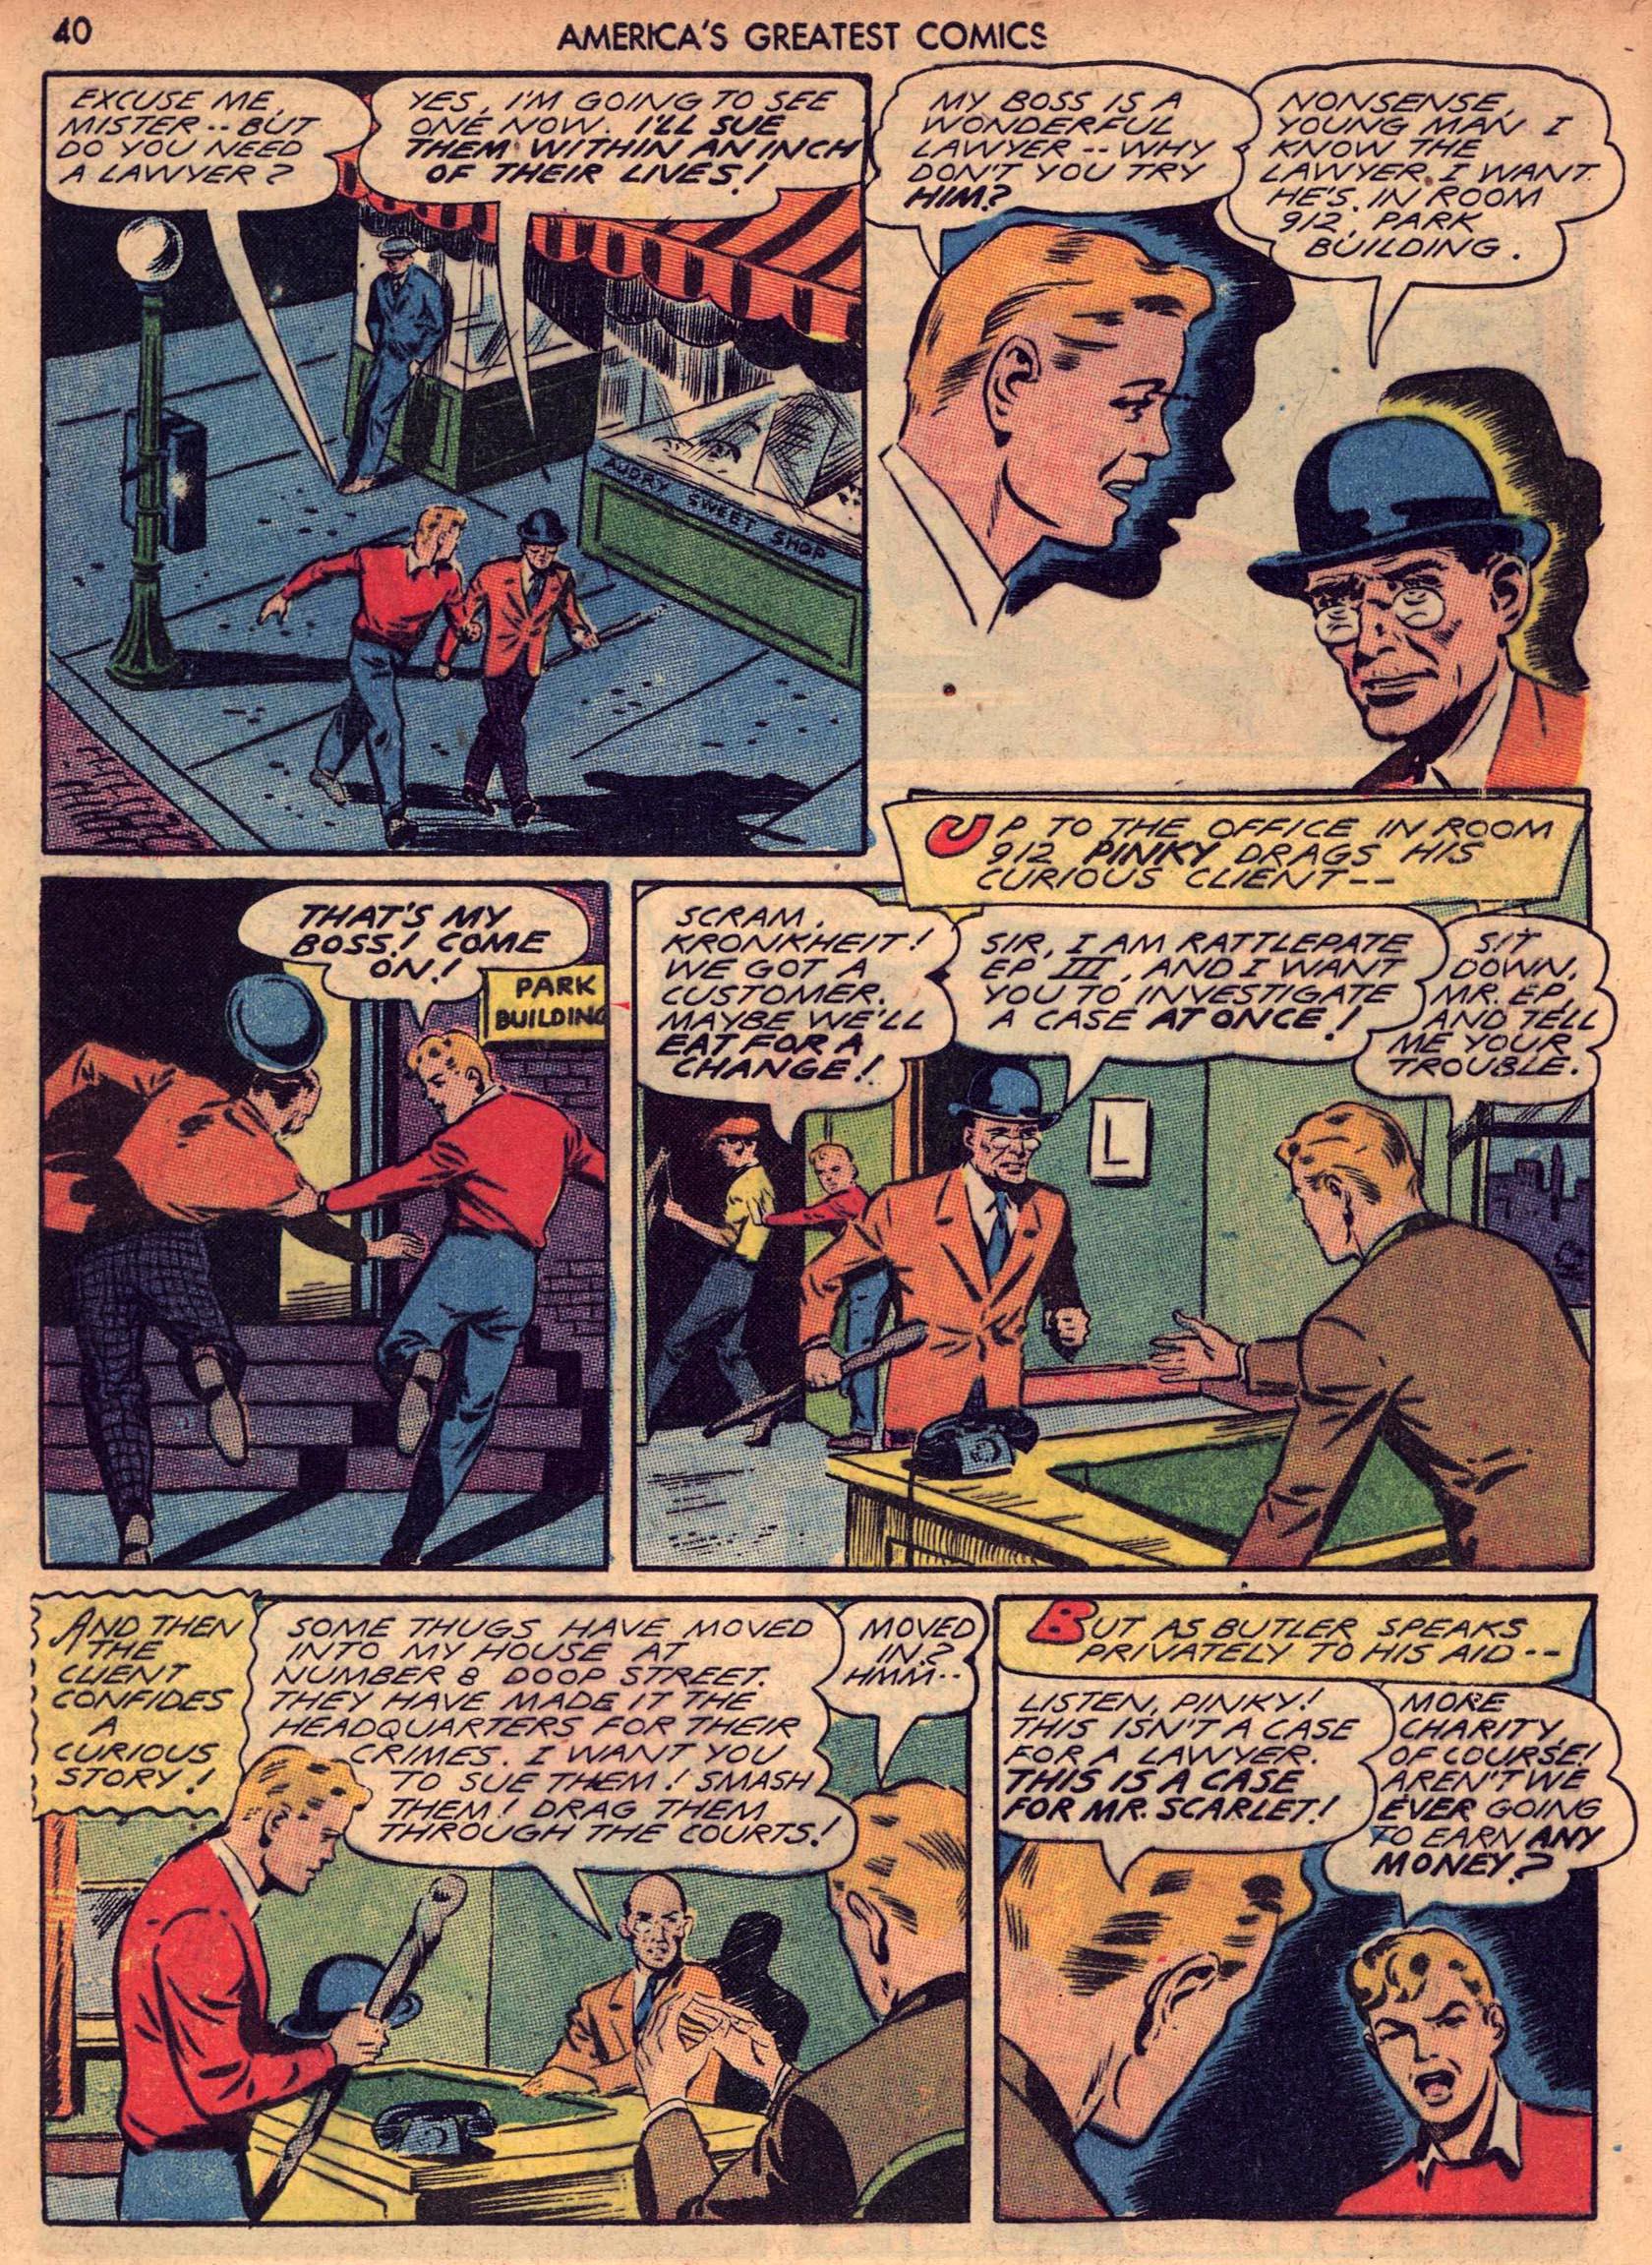 Read online America's Greatest Comics comic -  Issue #7 - 39